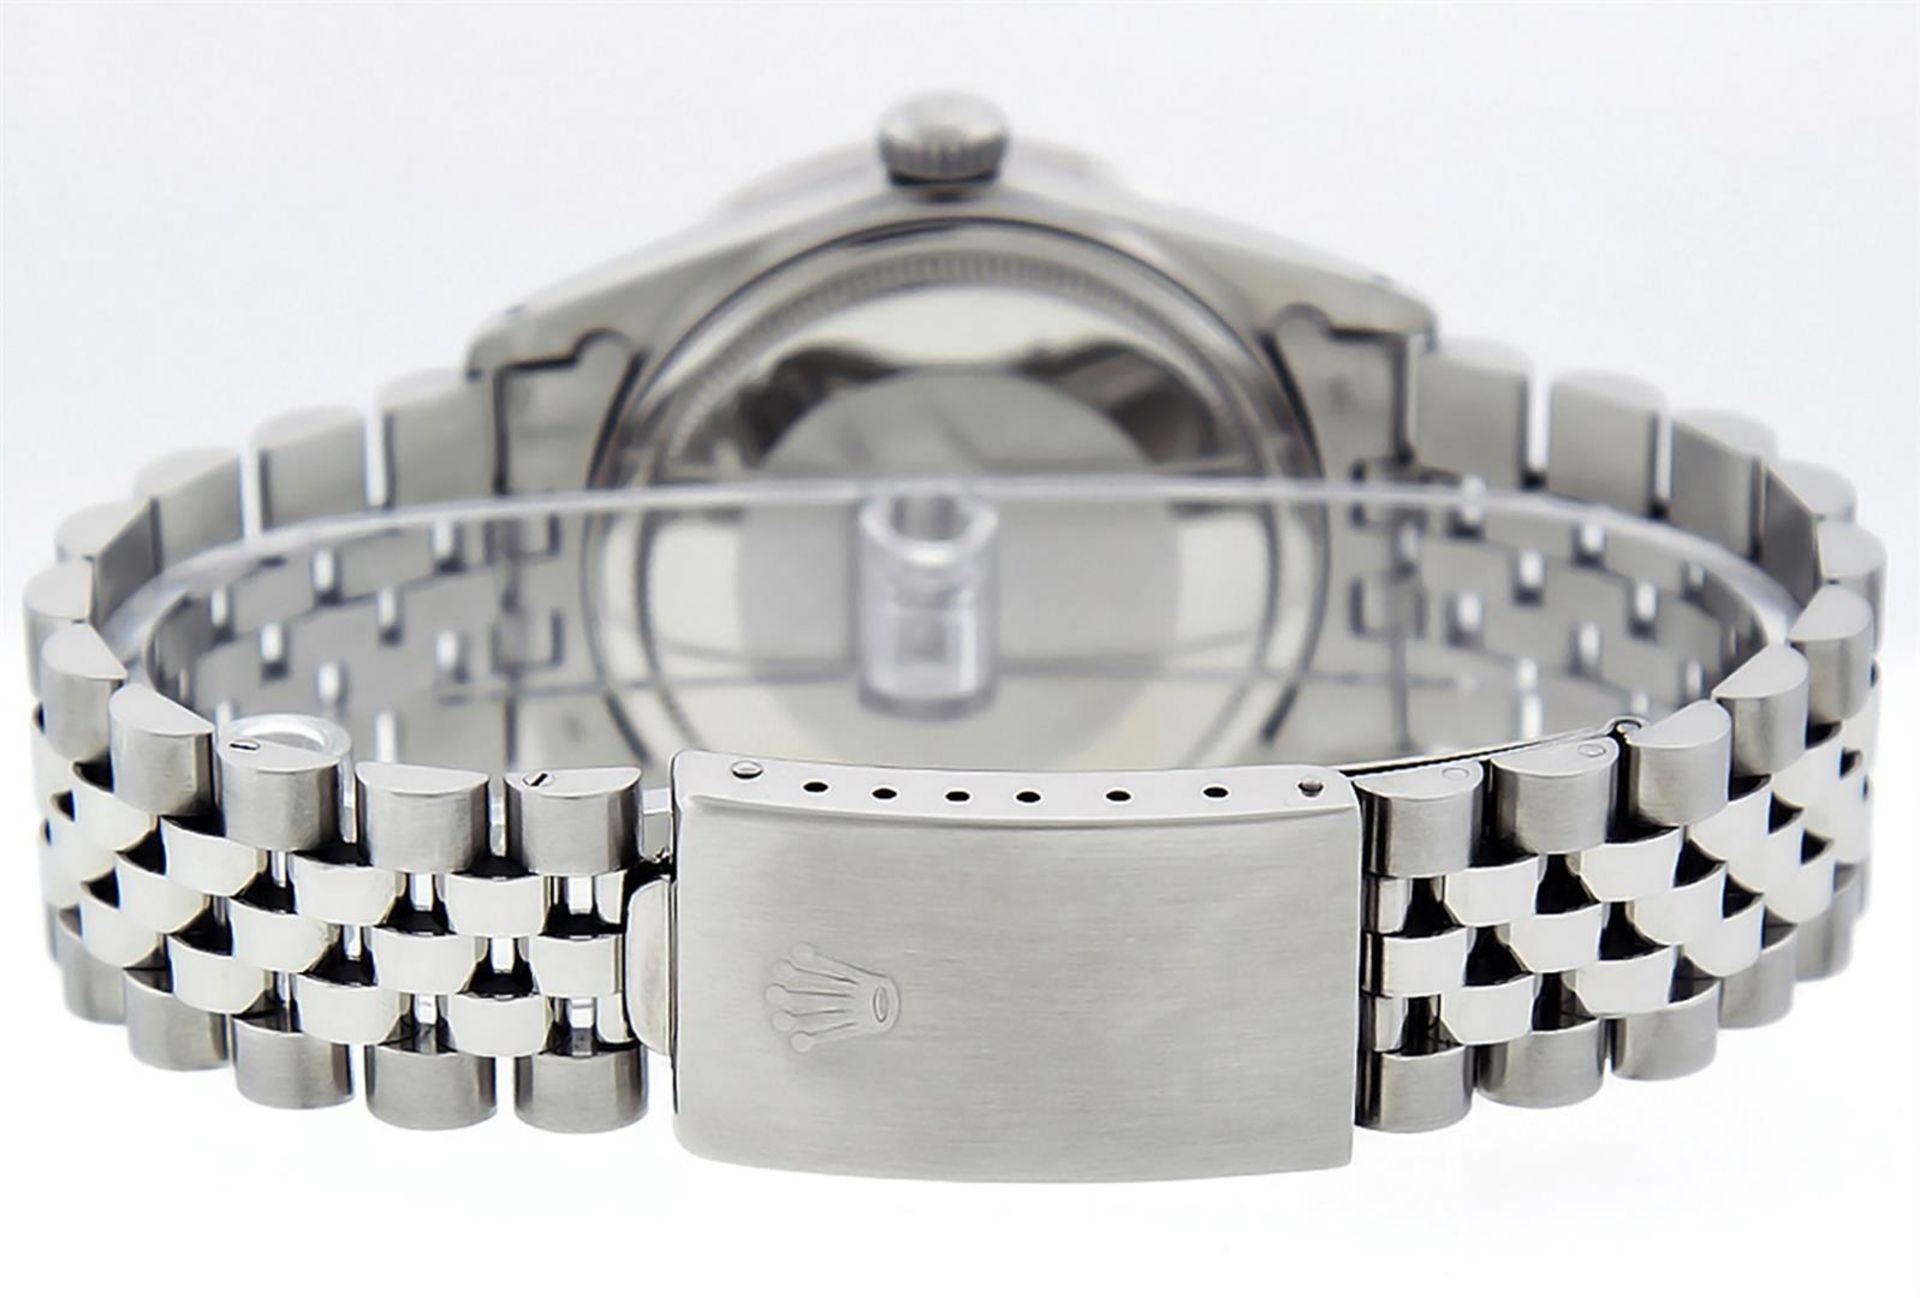 Rolex Mens Stainless Steel 36MM Blue Diamond Datejust Wristwatch - Image 6 of 9